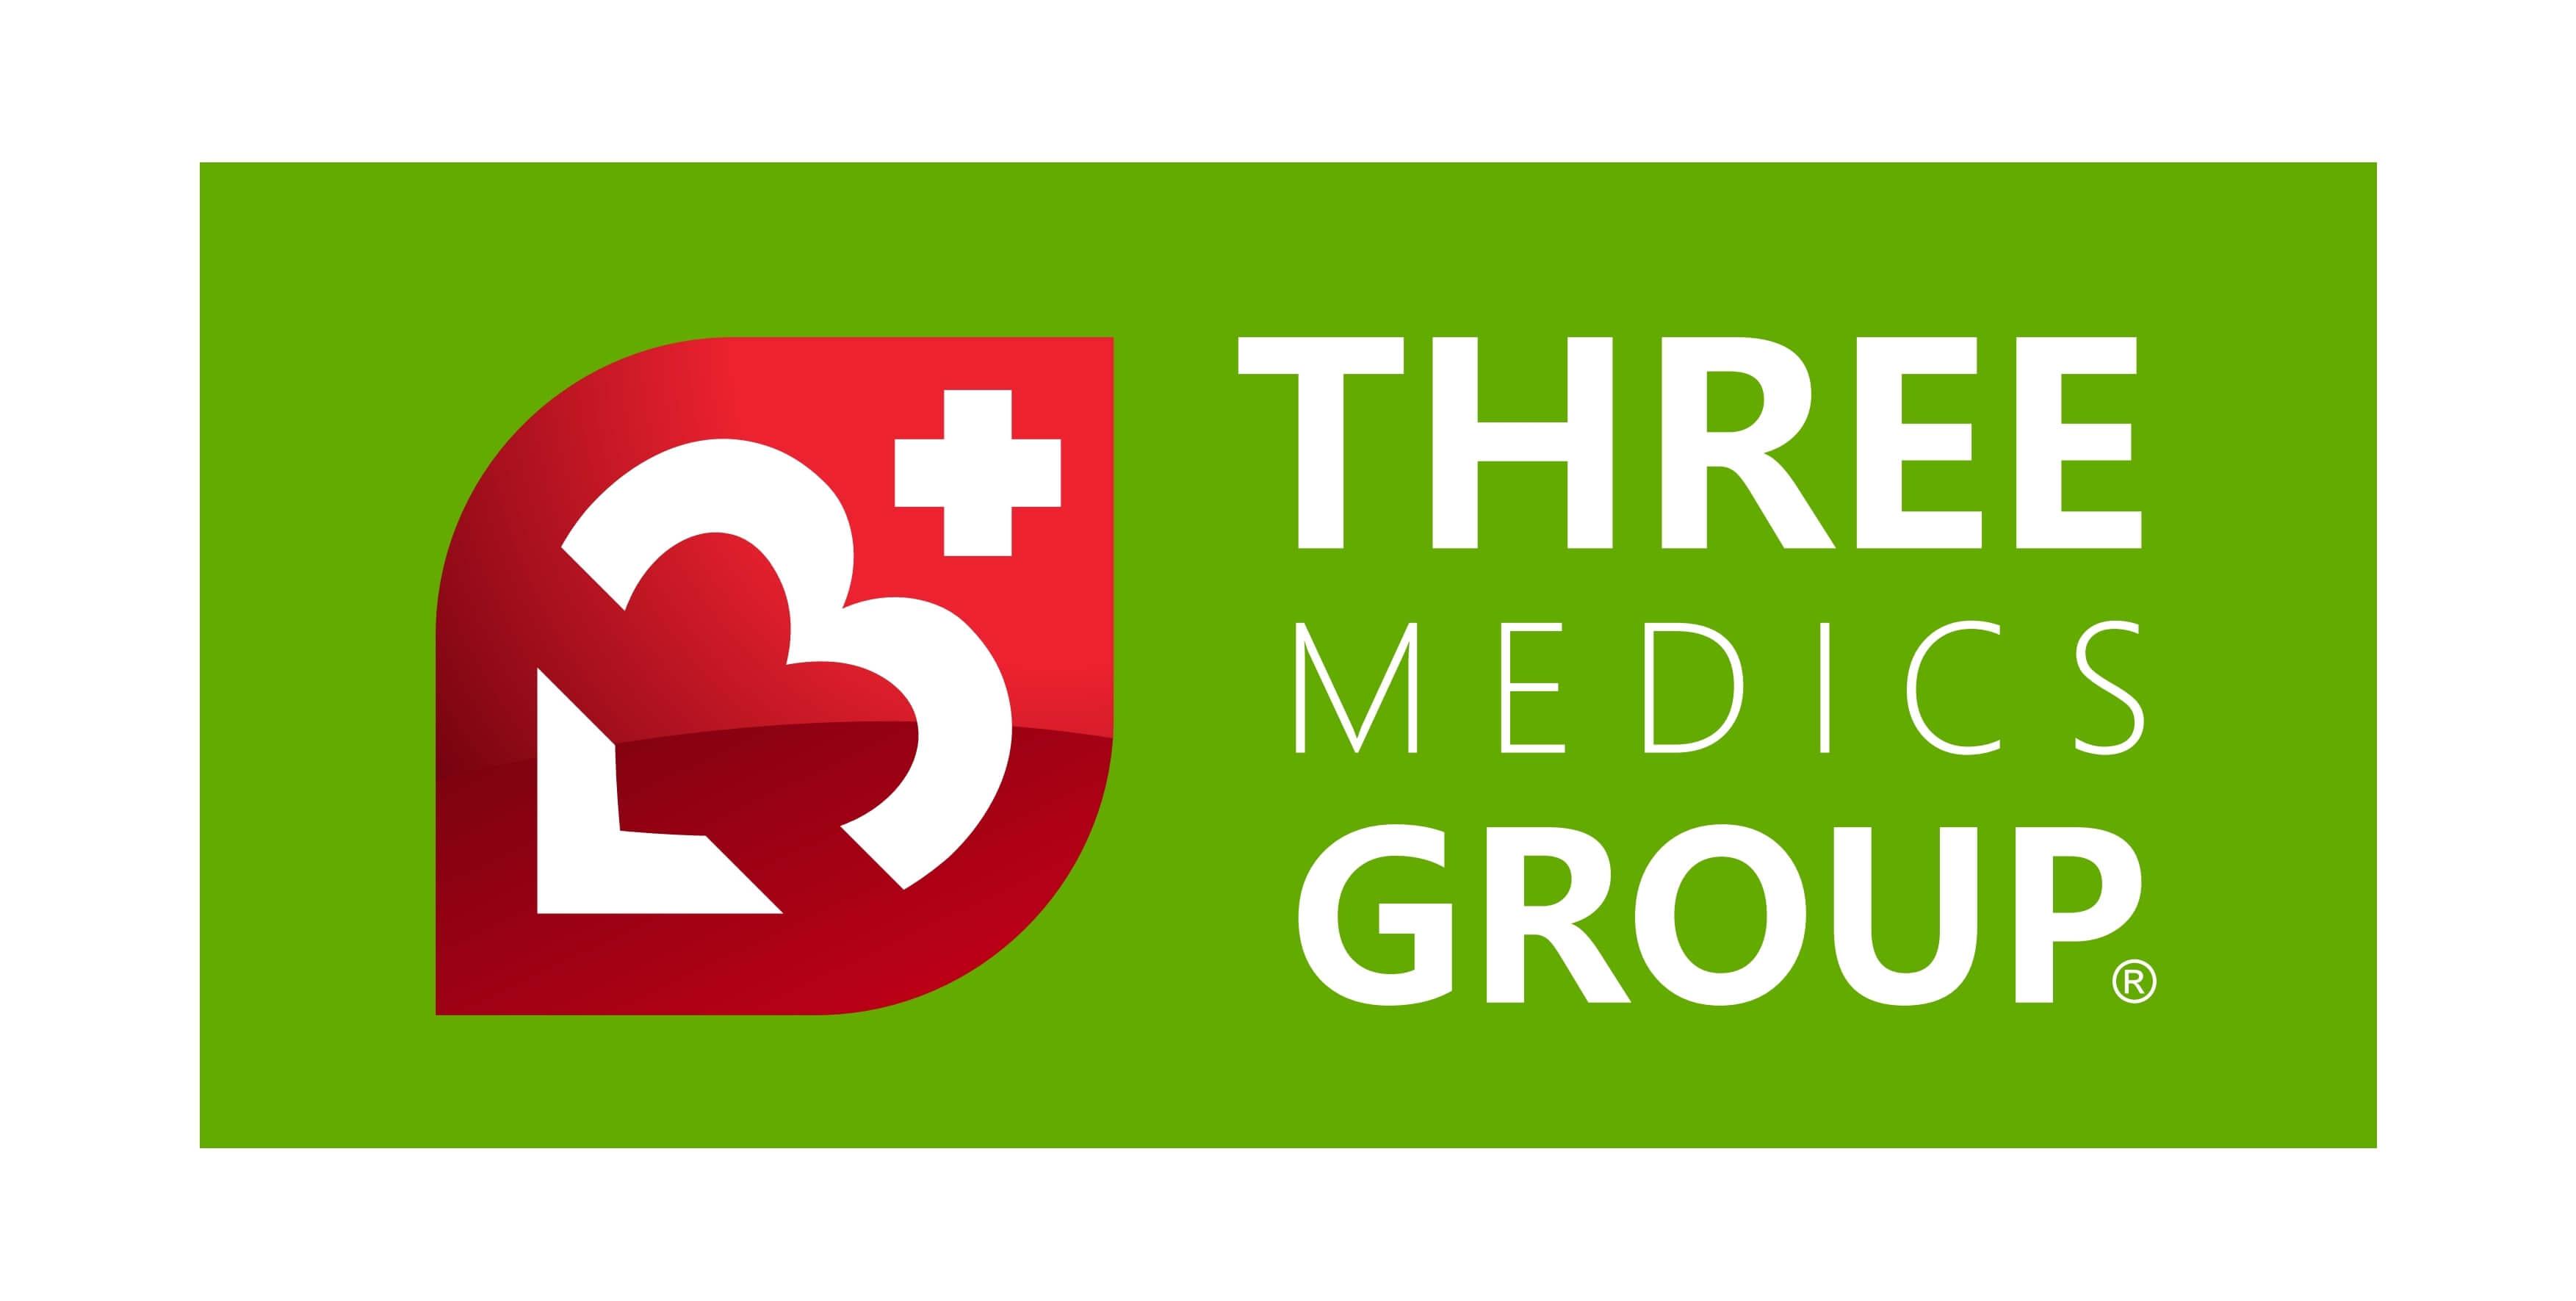 Three Medics Group